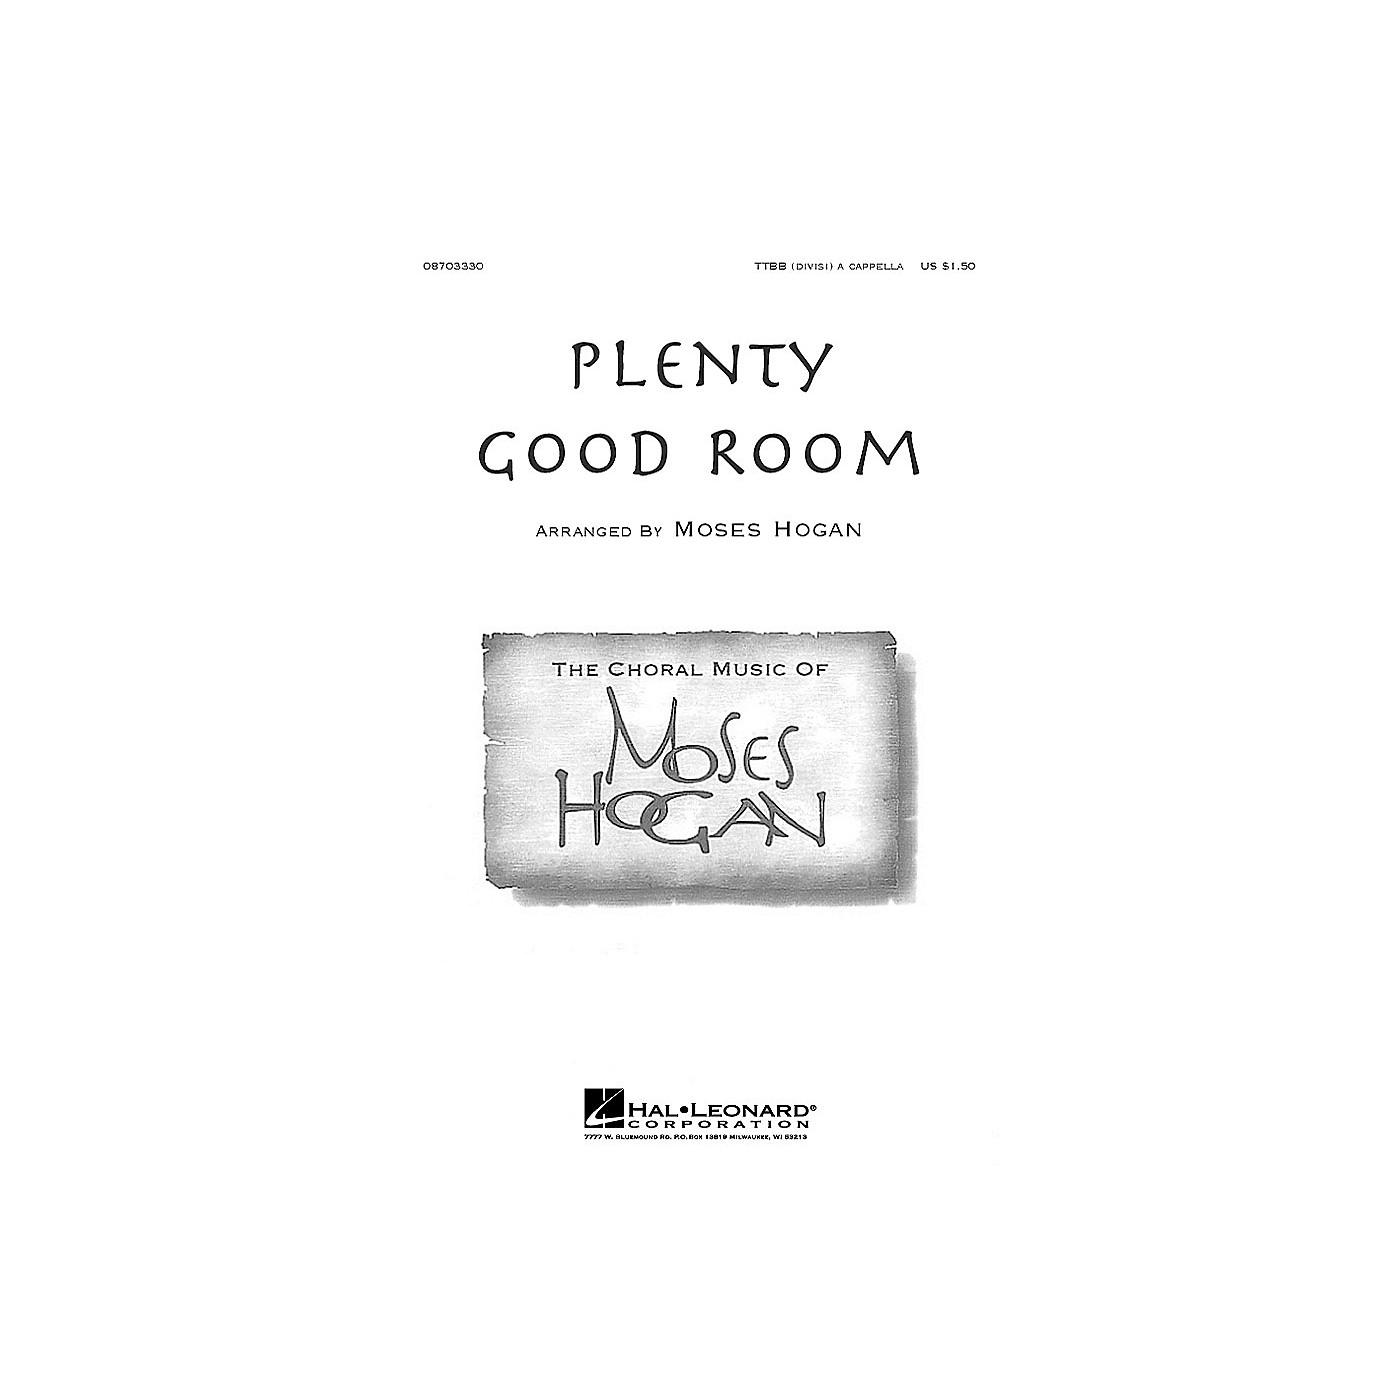 Hal Leonard Plenty Good Room TTBB Div A Cappella arranged by Moses Hogan thumbnail